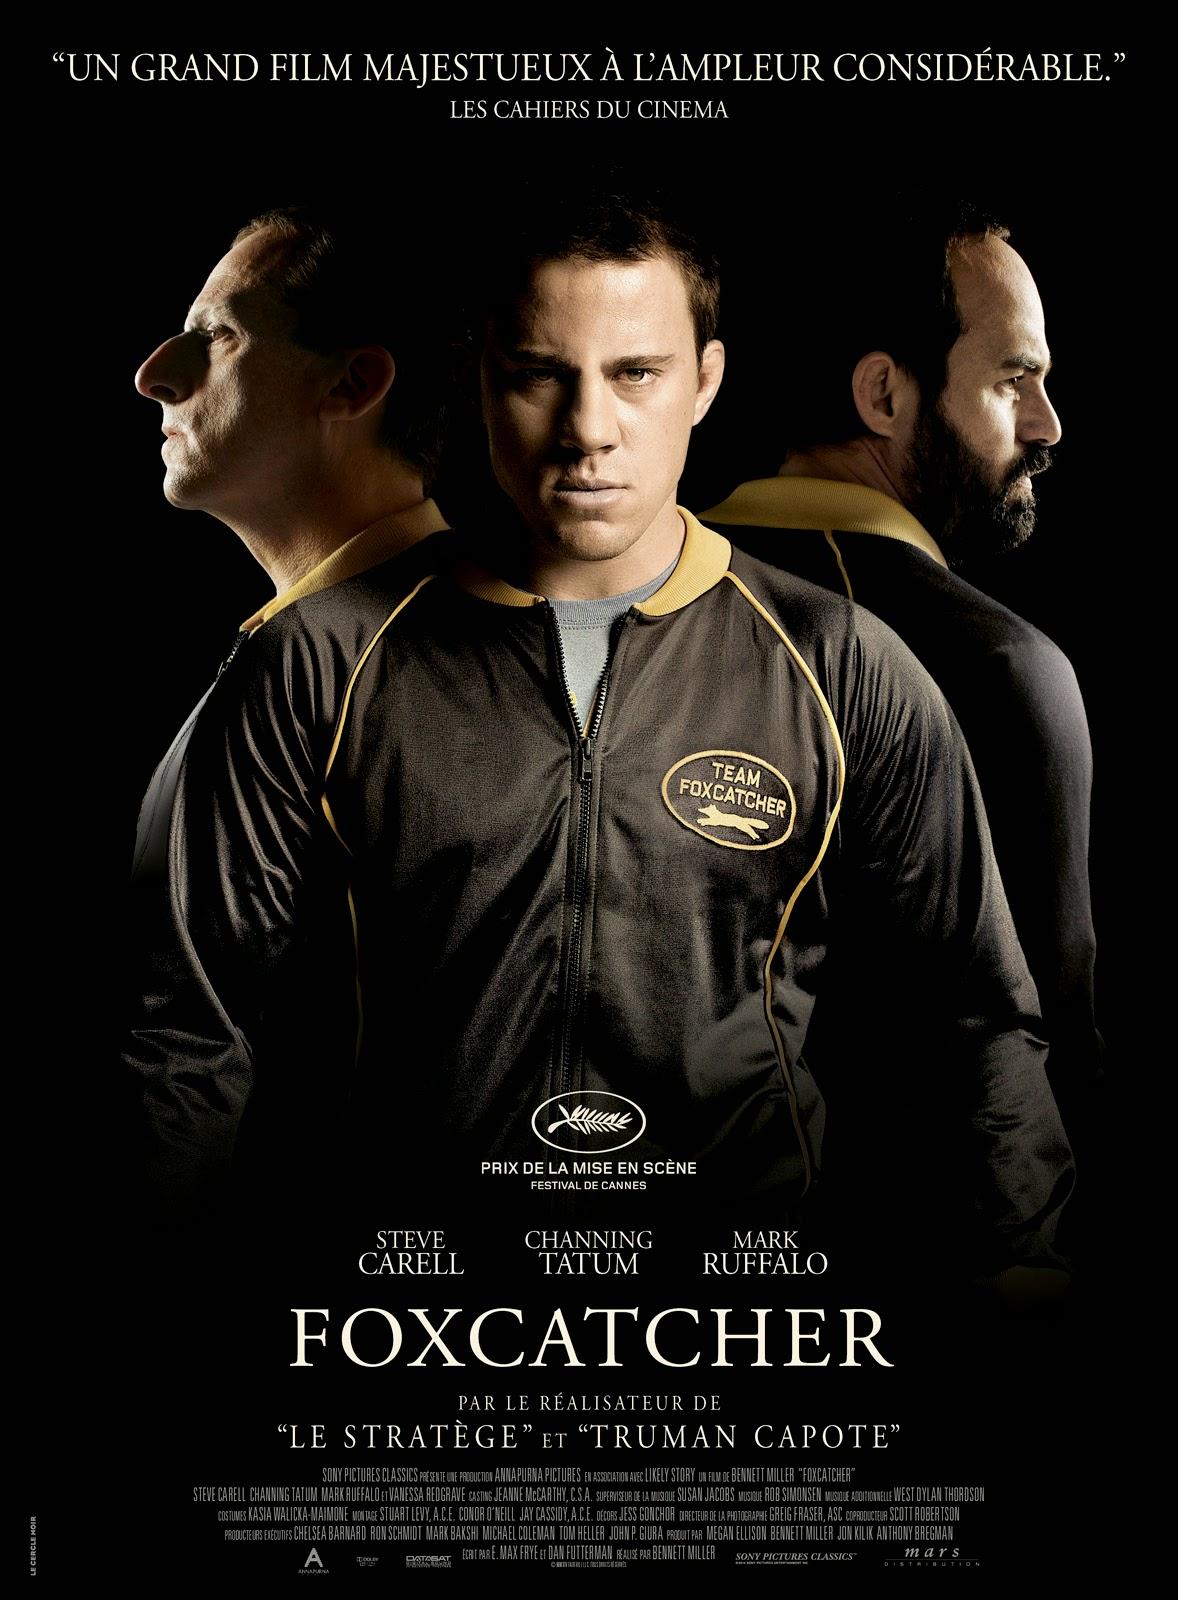 http://fuckingcinephiles.blogspot.fr/2015/01/critique-foxcatcher.html